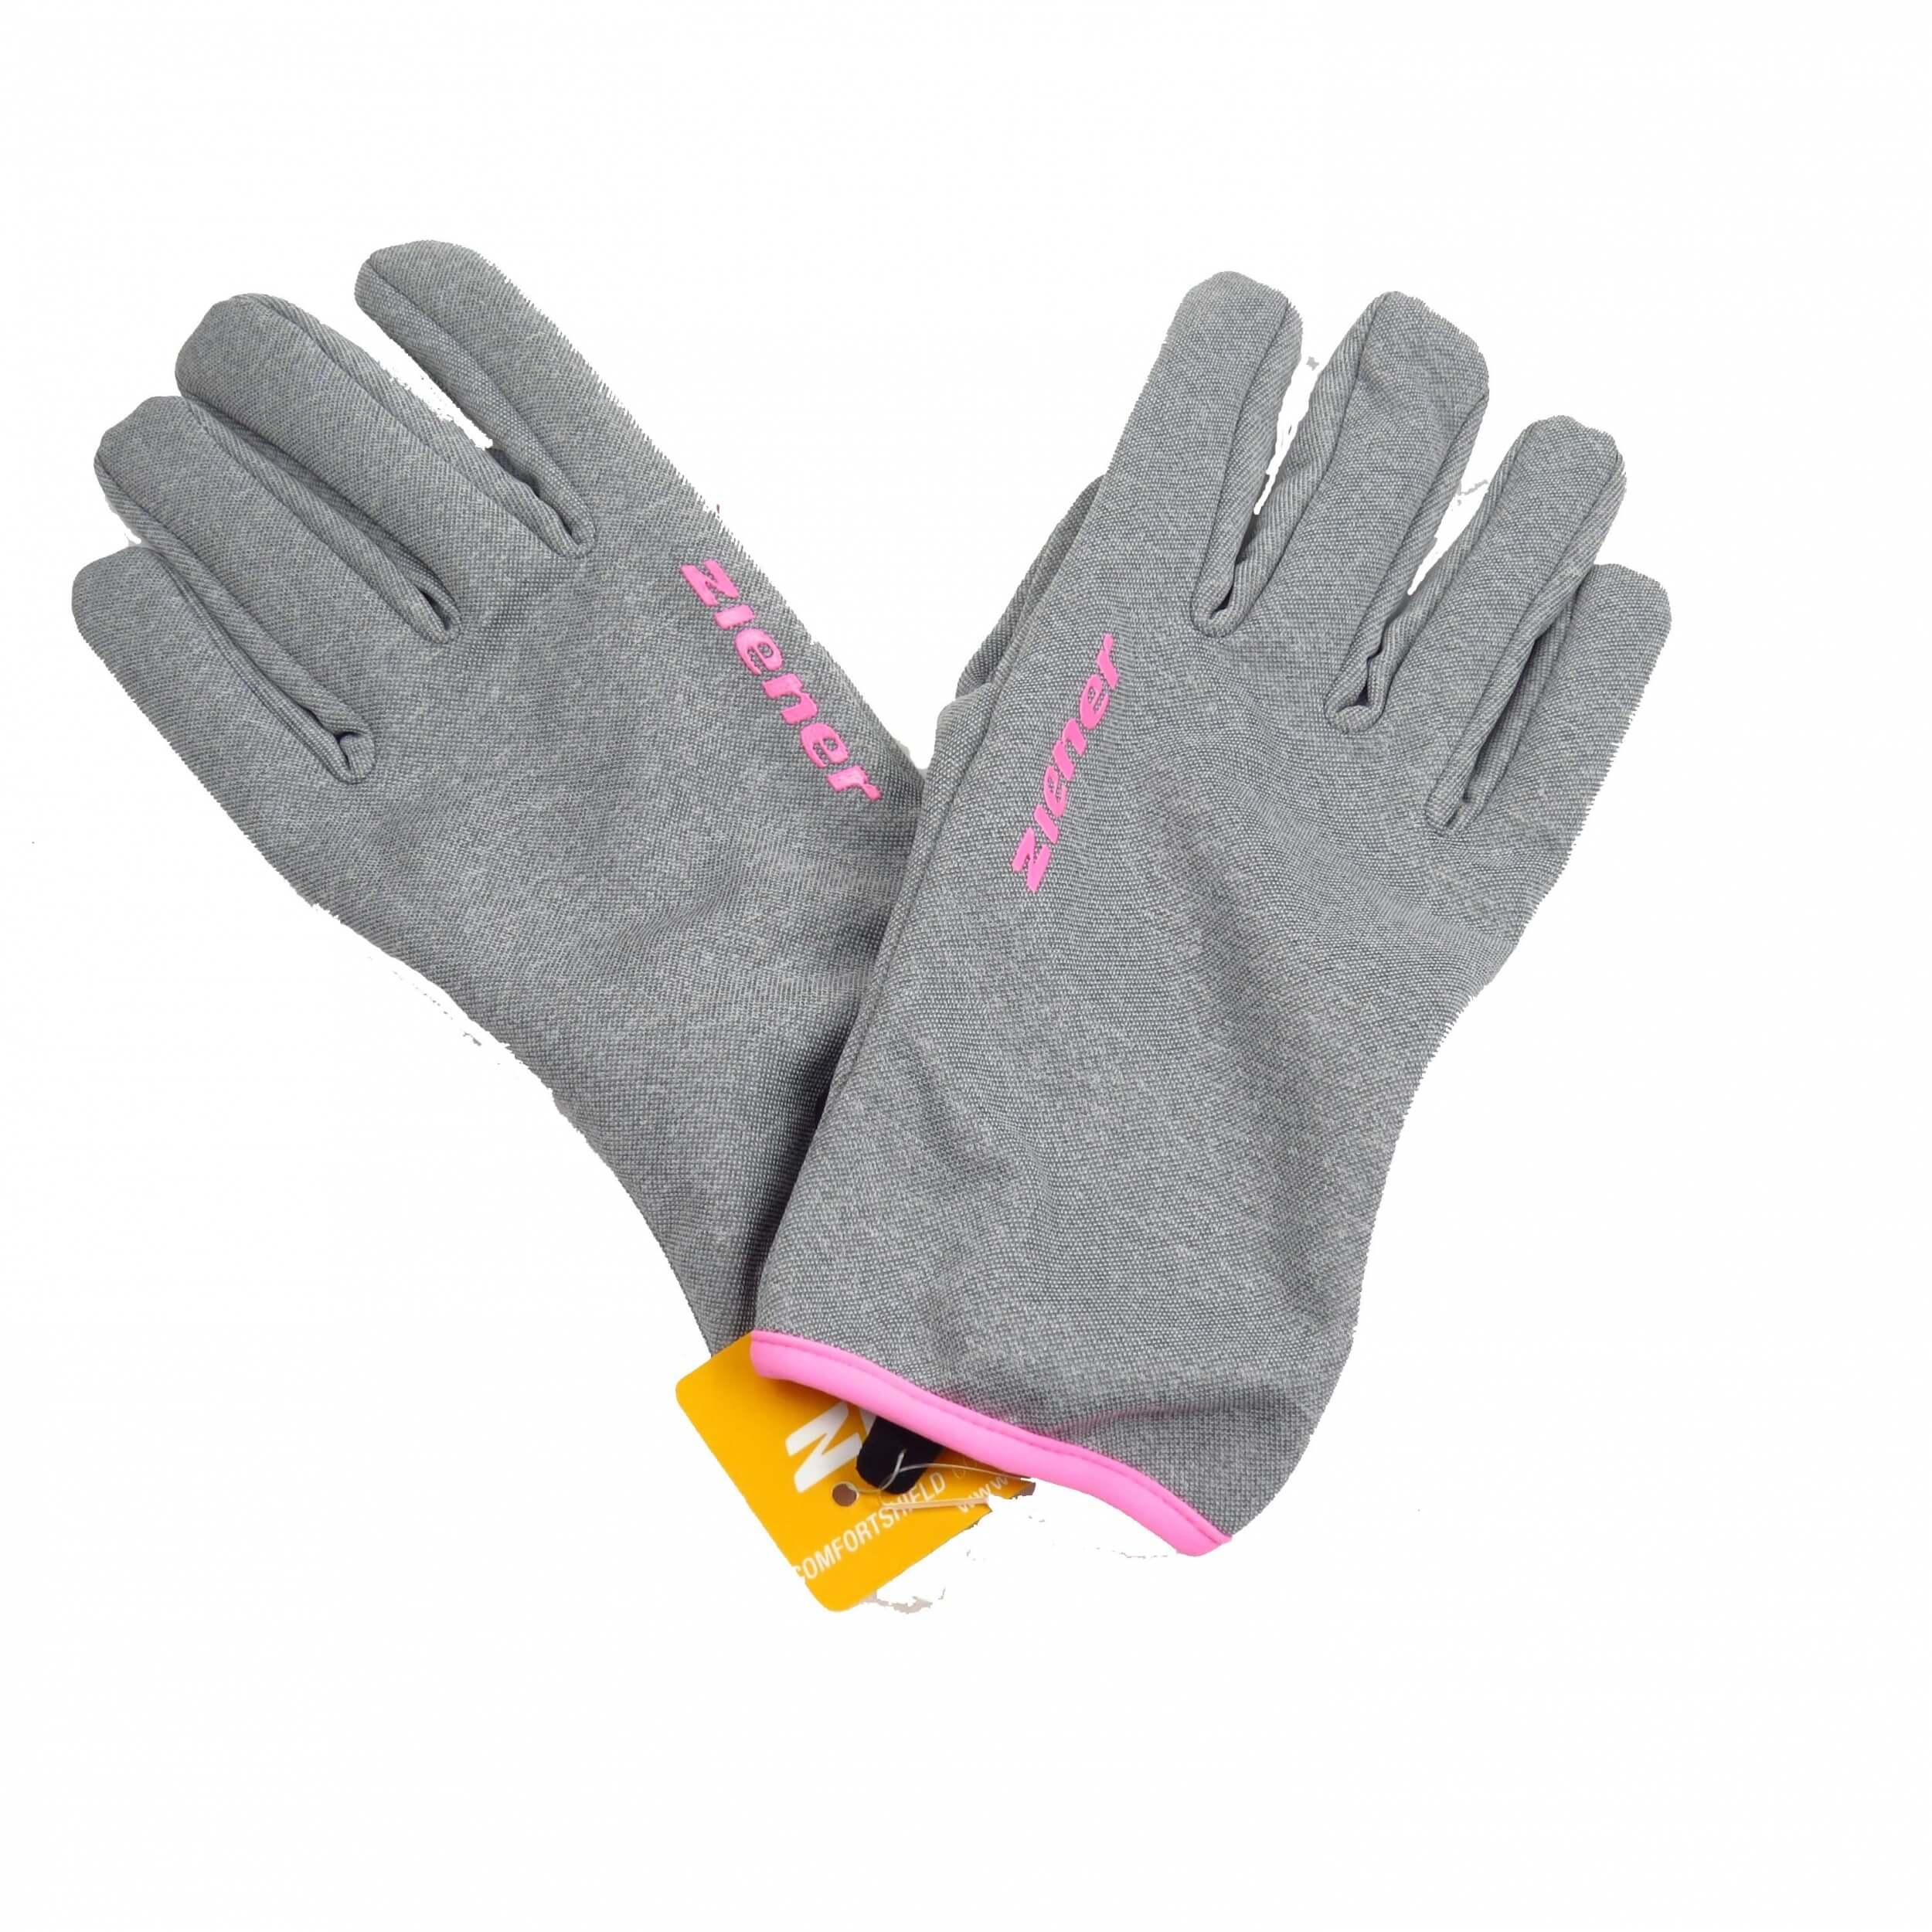 ZIENER Winter Handschuhe Innovation grau 758